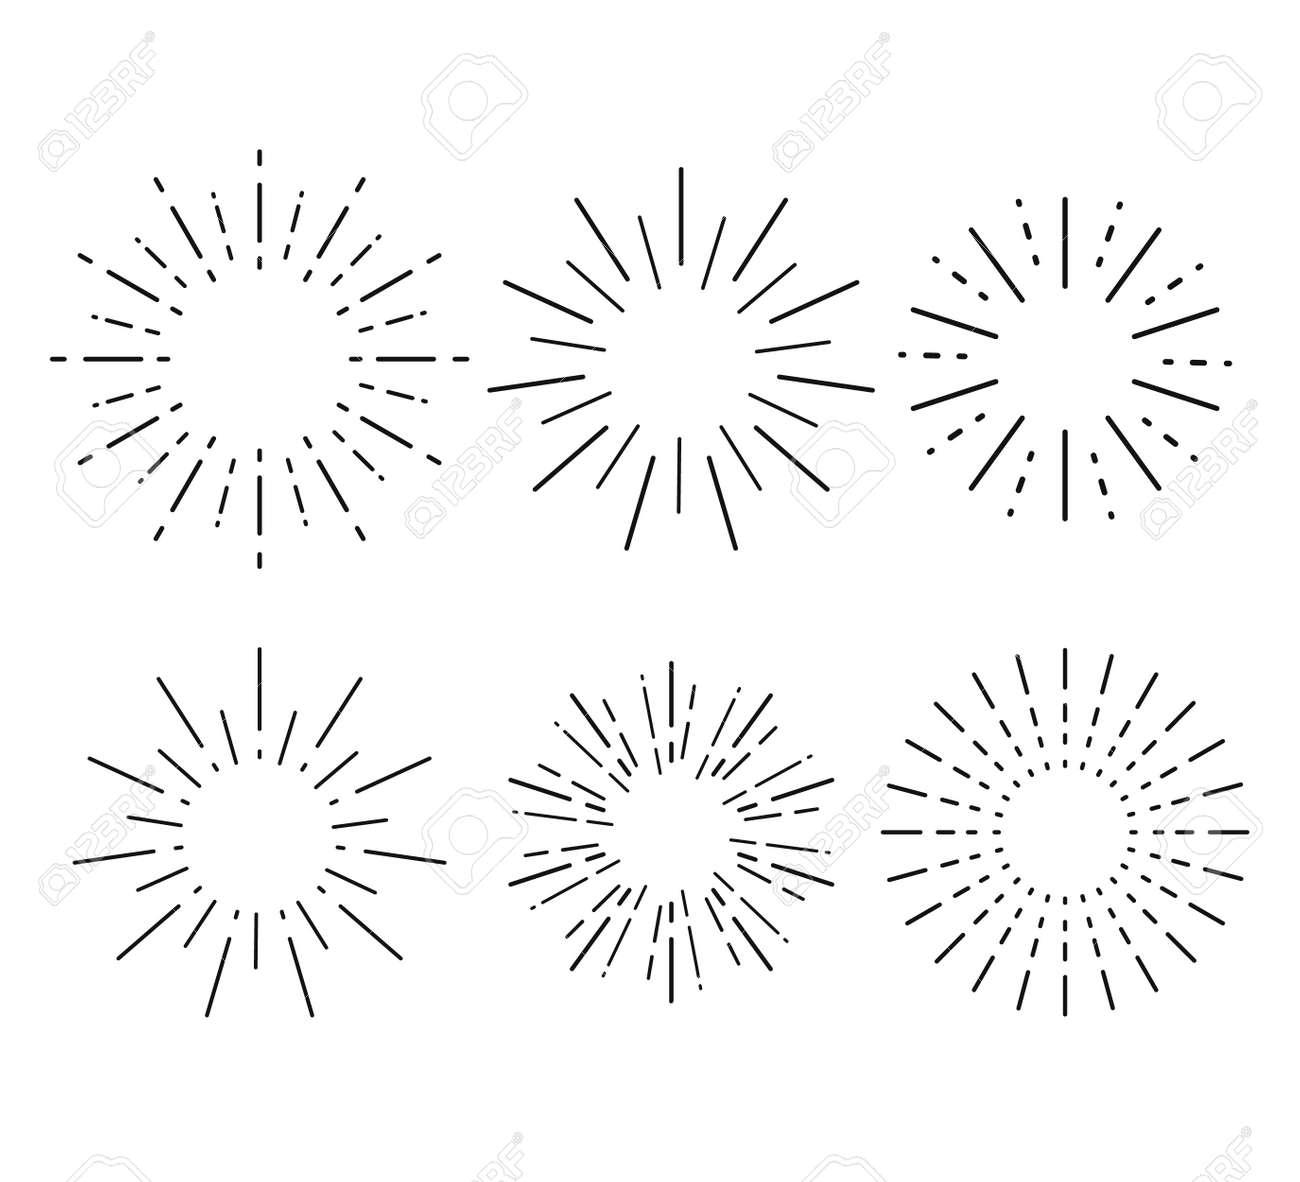 Sunburst set. Collection sunburst, star, firework explosion. Vector illustration - 166668604